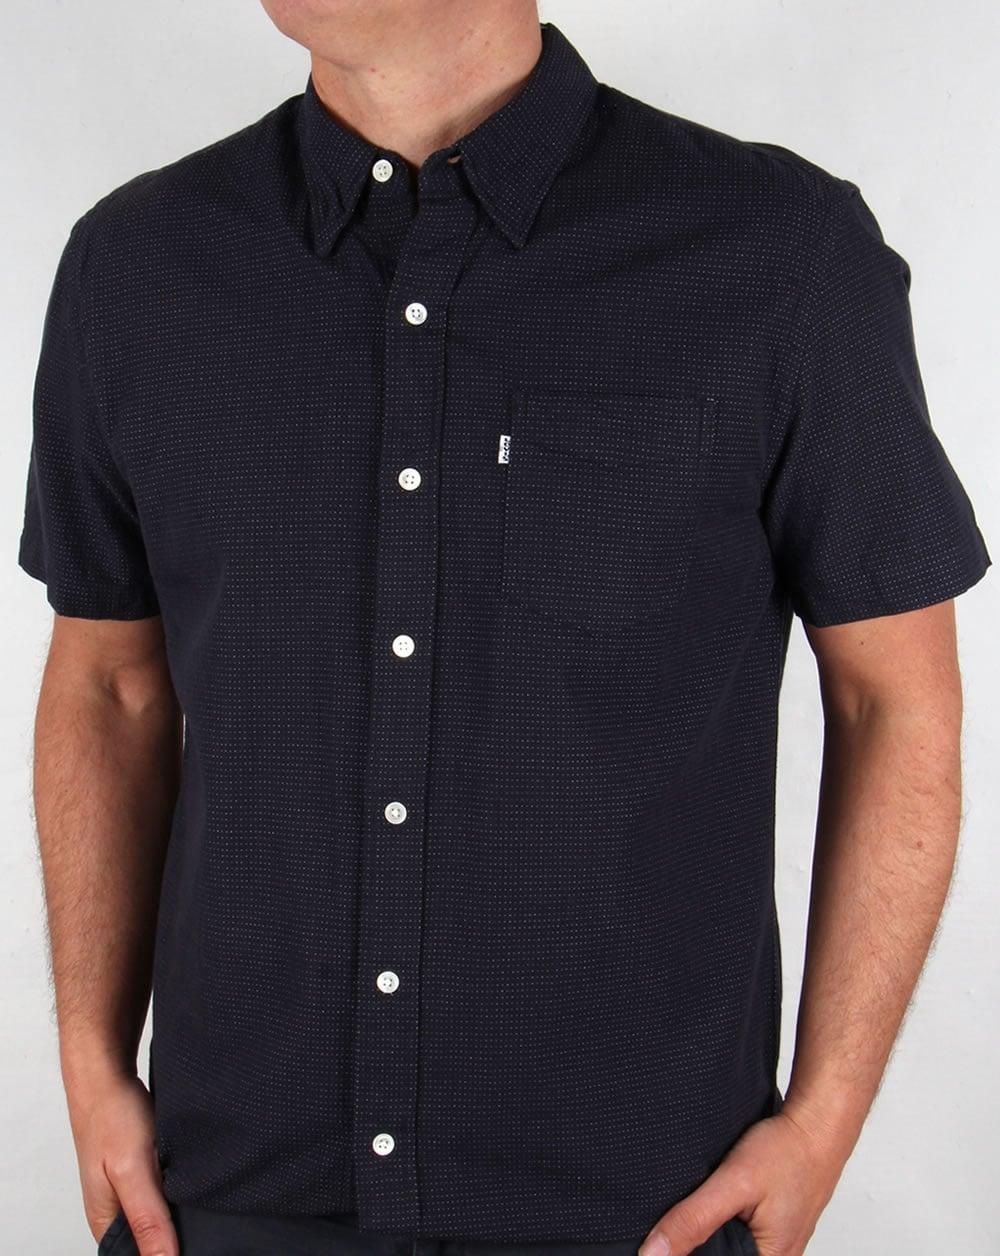 469f2cc3b Levis Sunset One Pocket Short Sleeve Shirt Dark Indigo